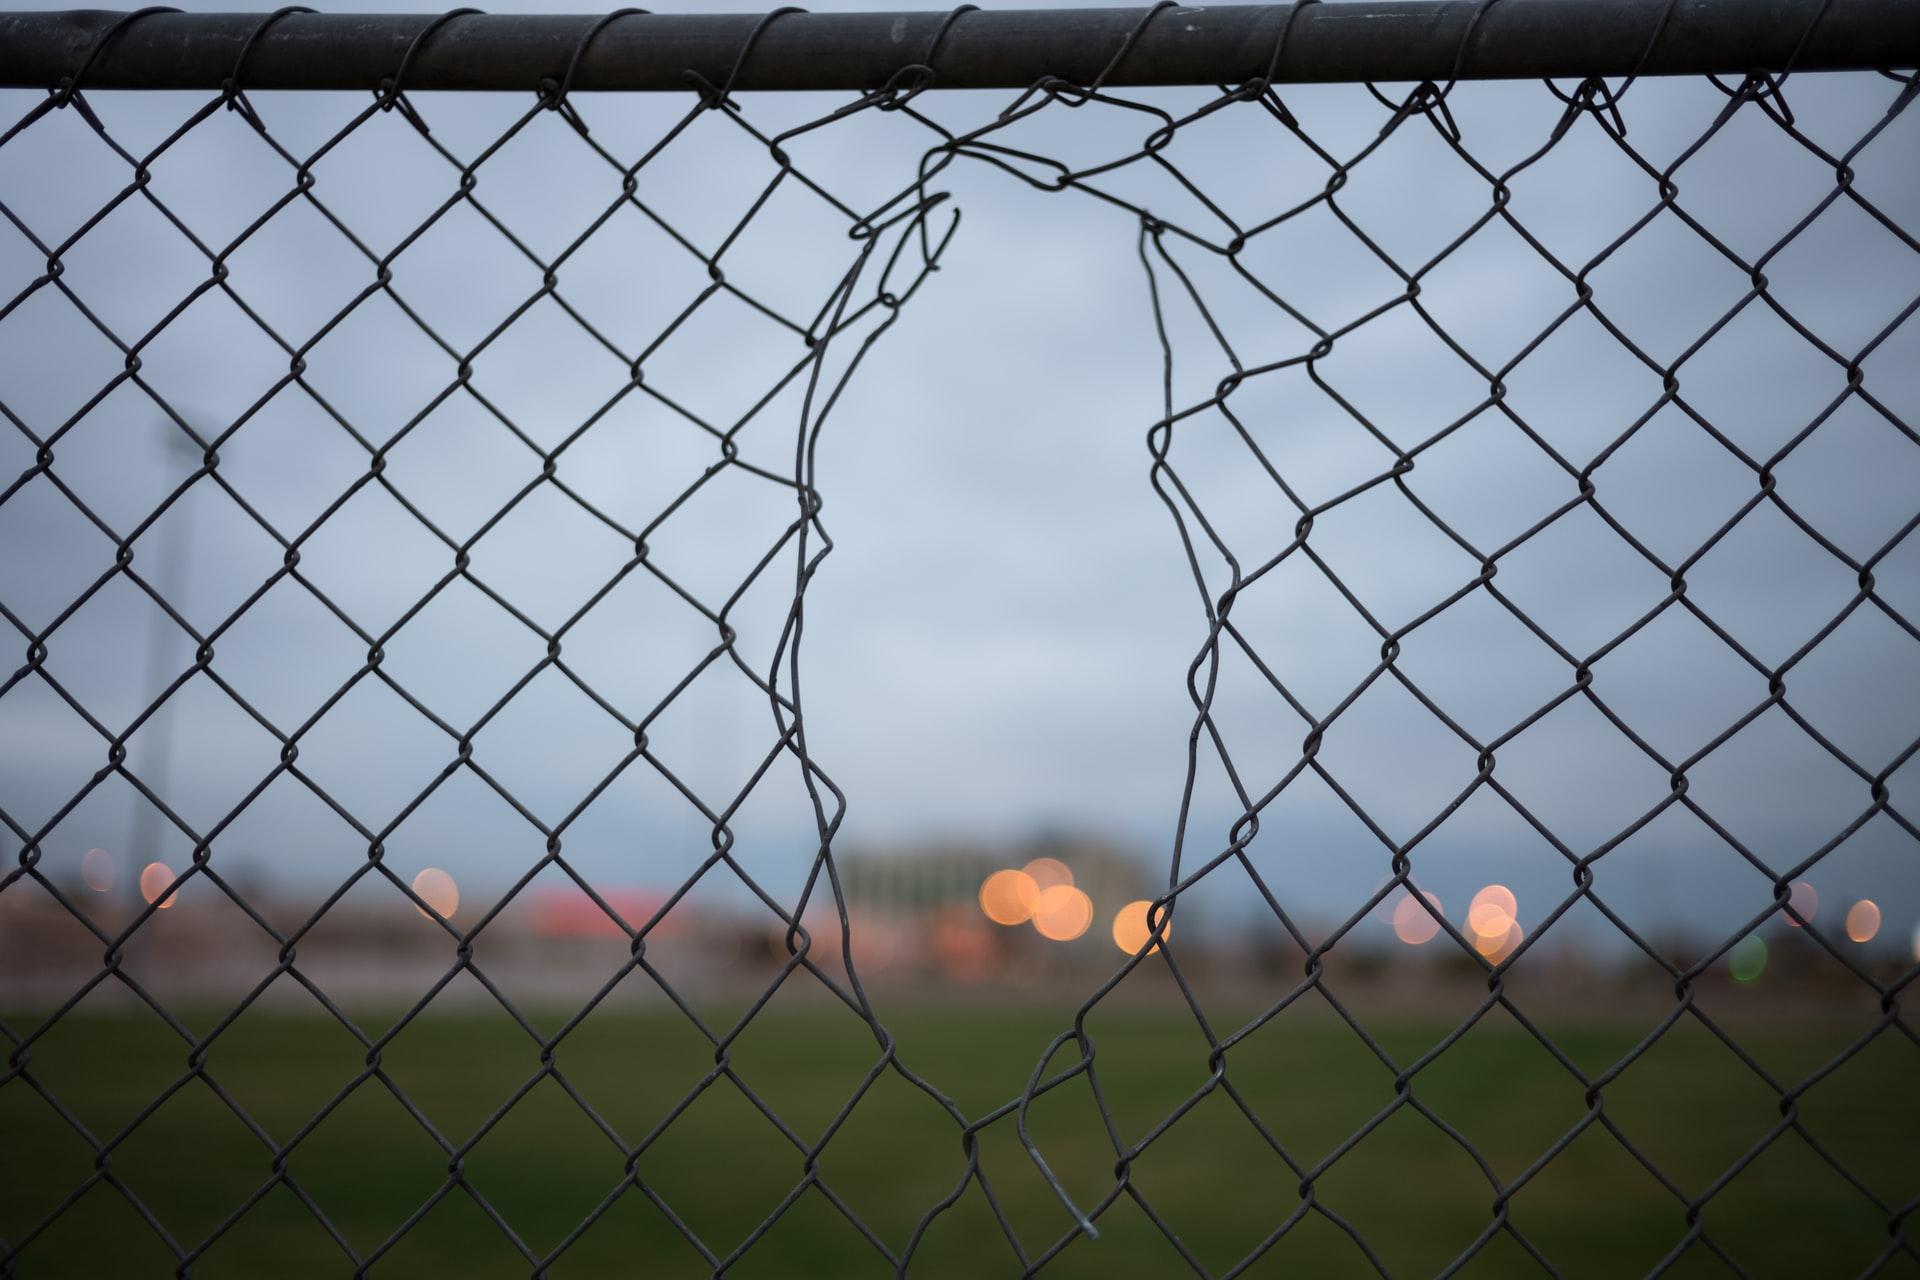 Flexible Fences